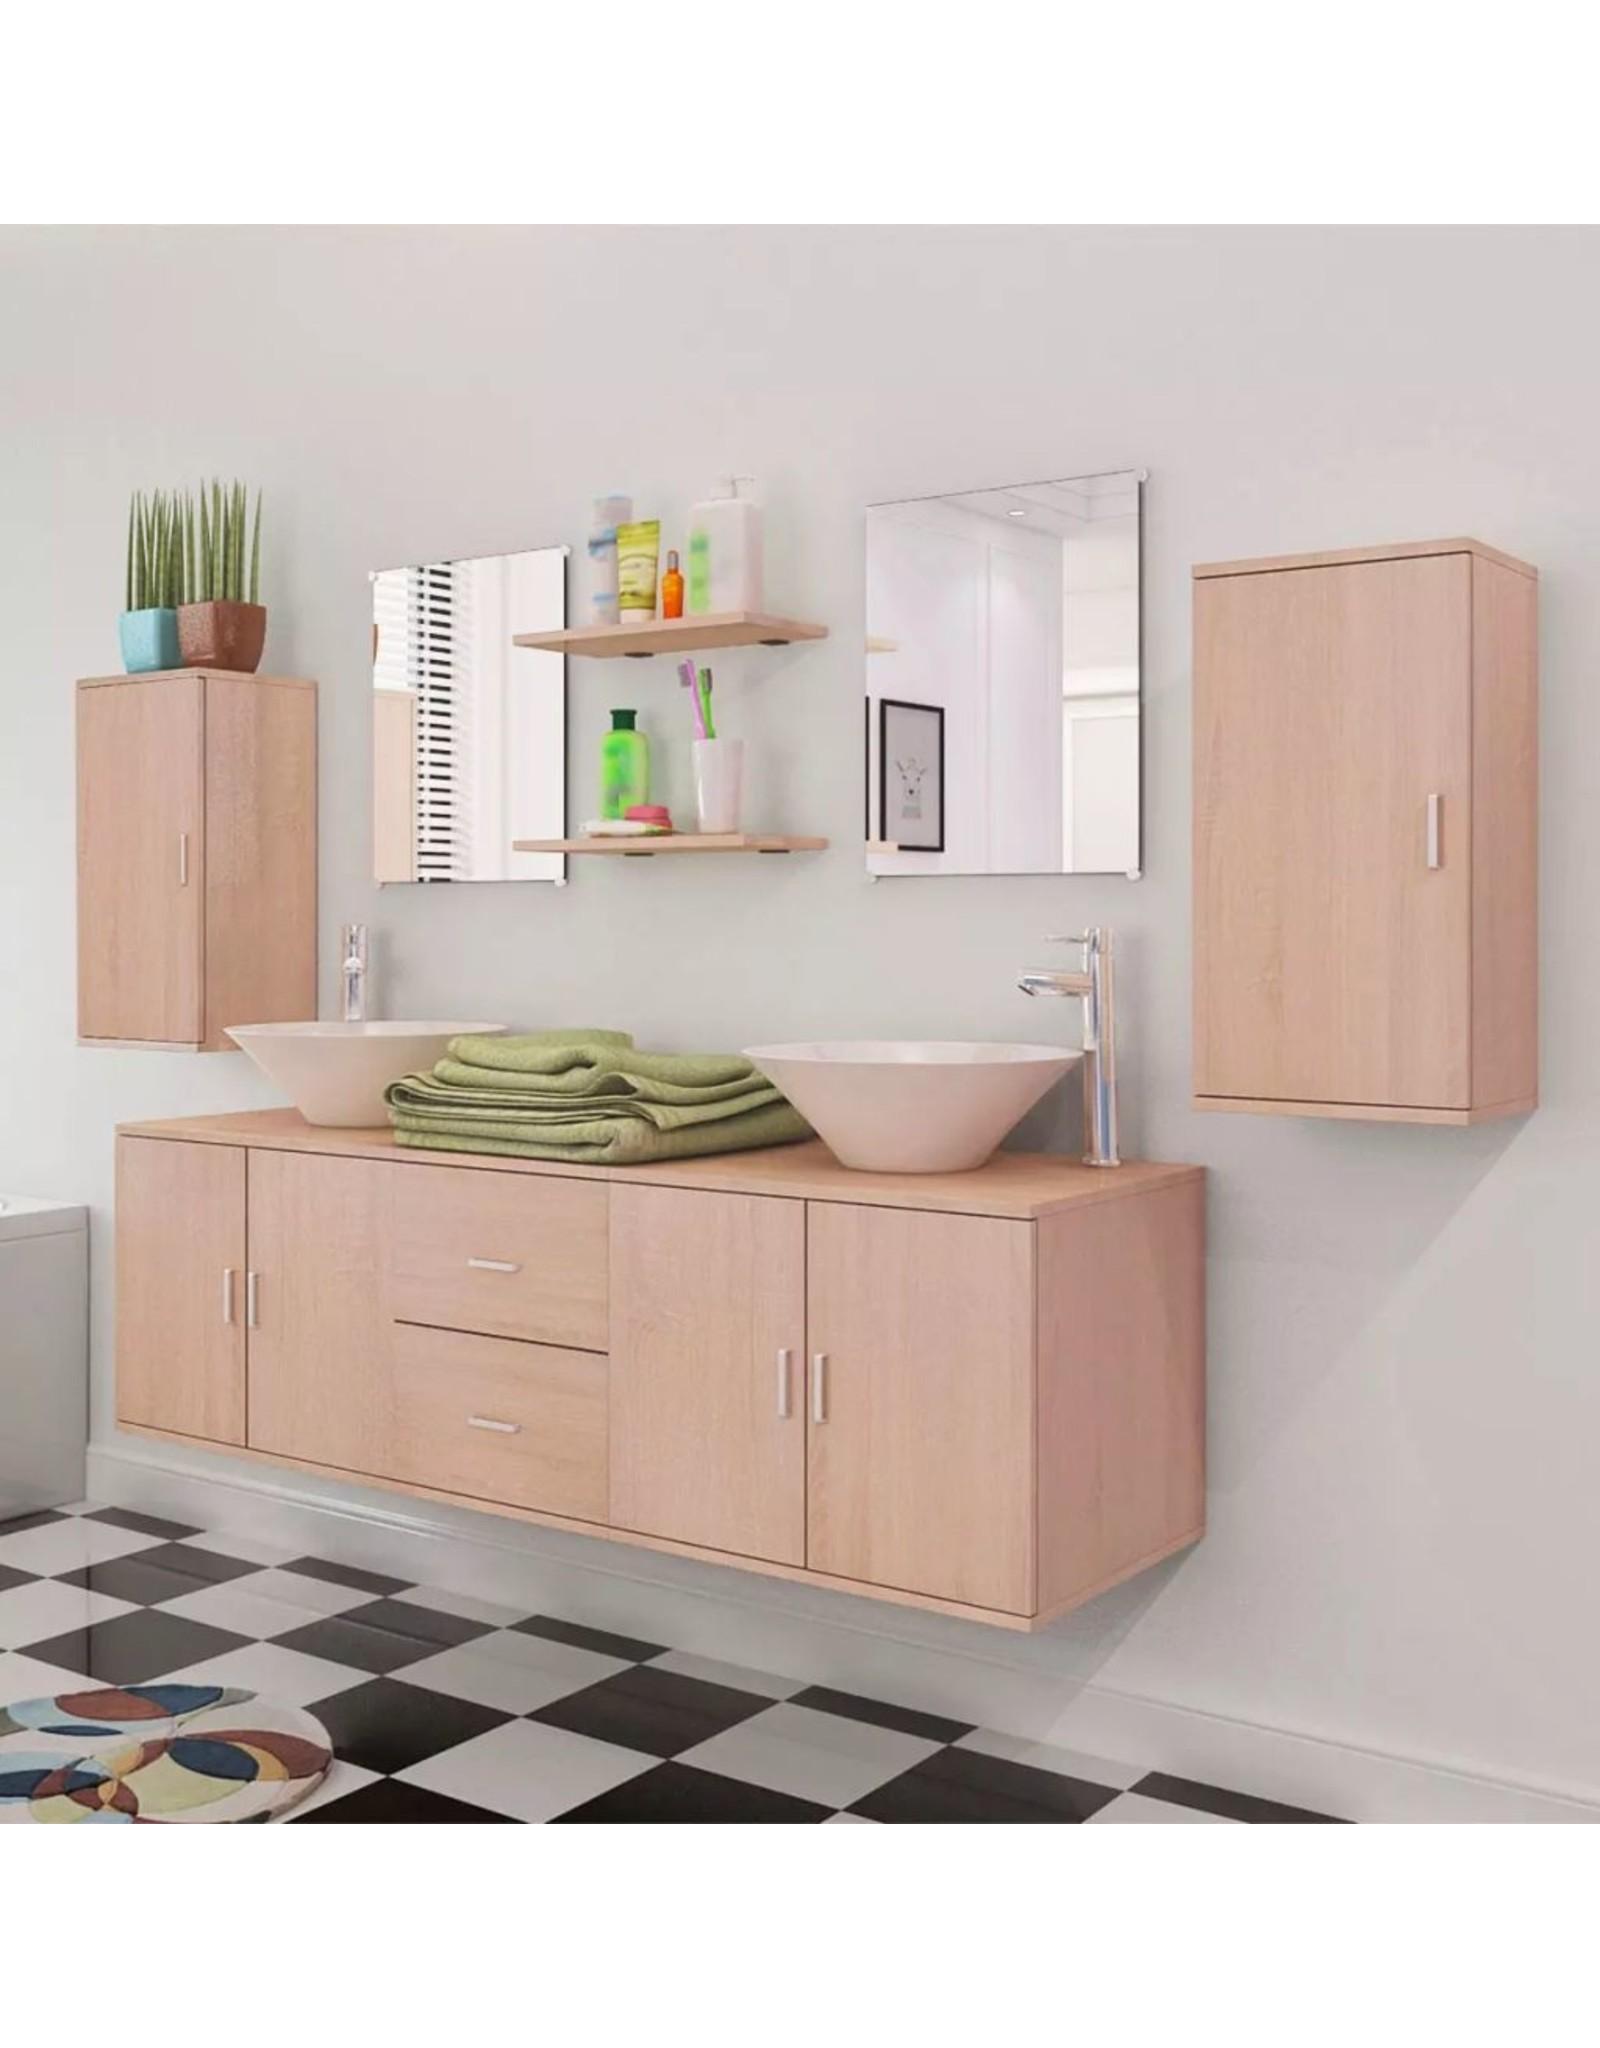 Badkamermeubelset 11-delig met kraan en wasbak beige